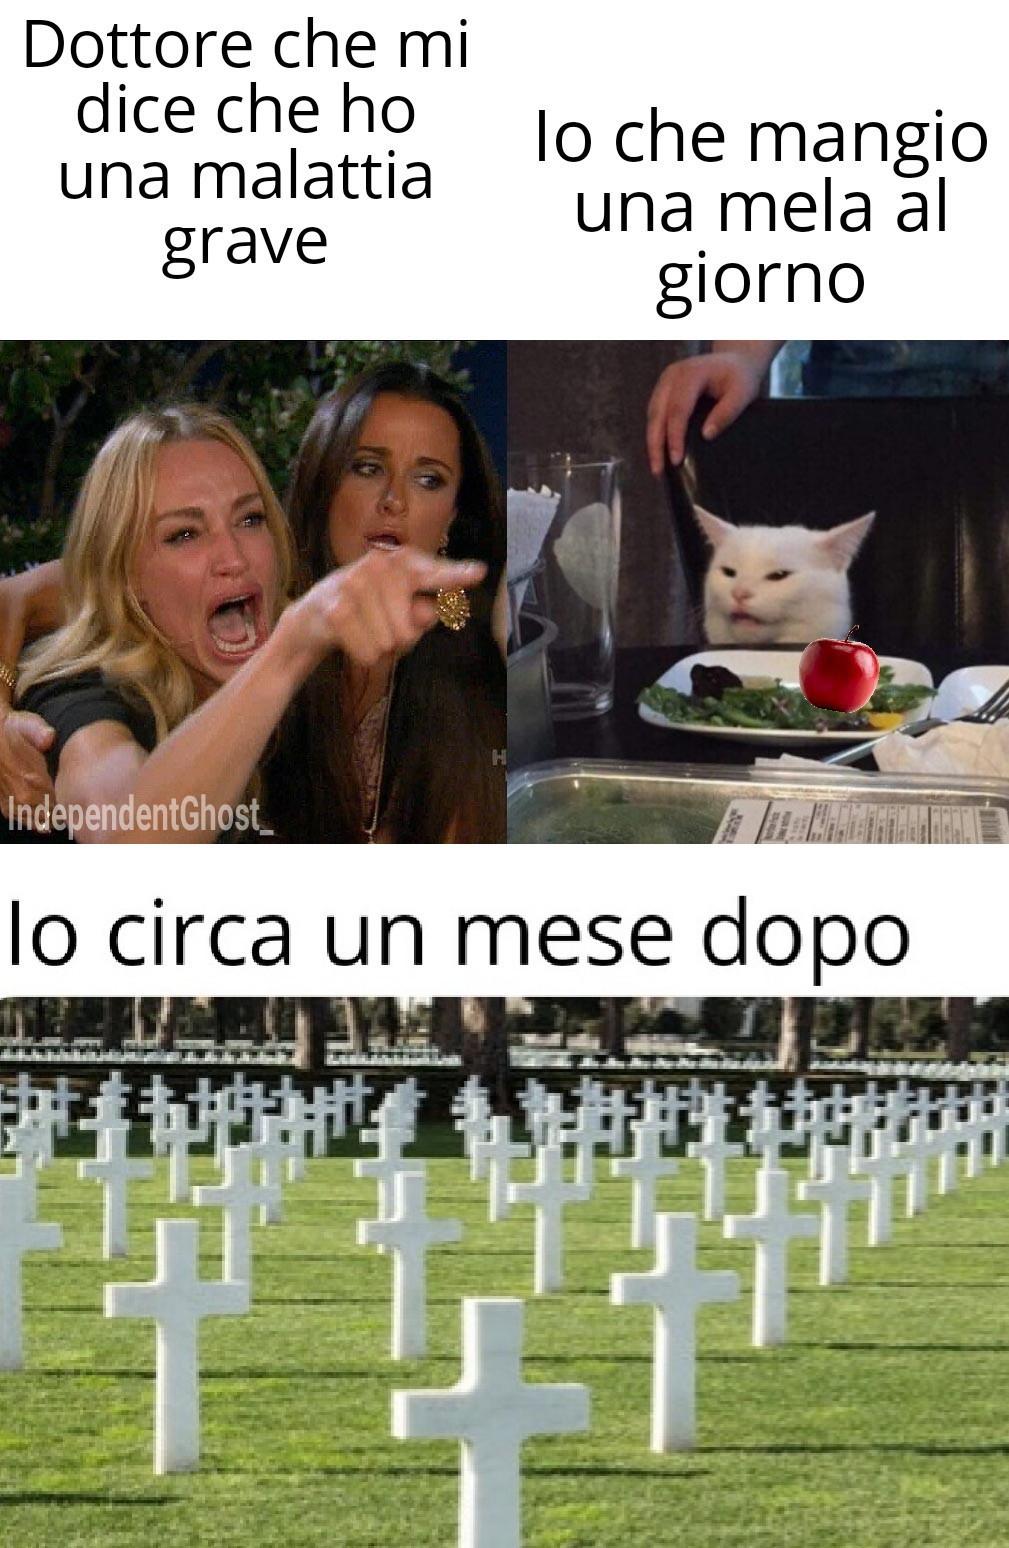 Scorrete in basso - meme